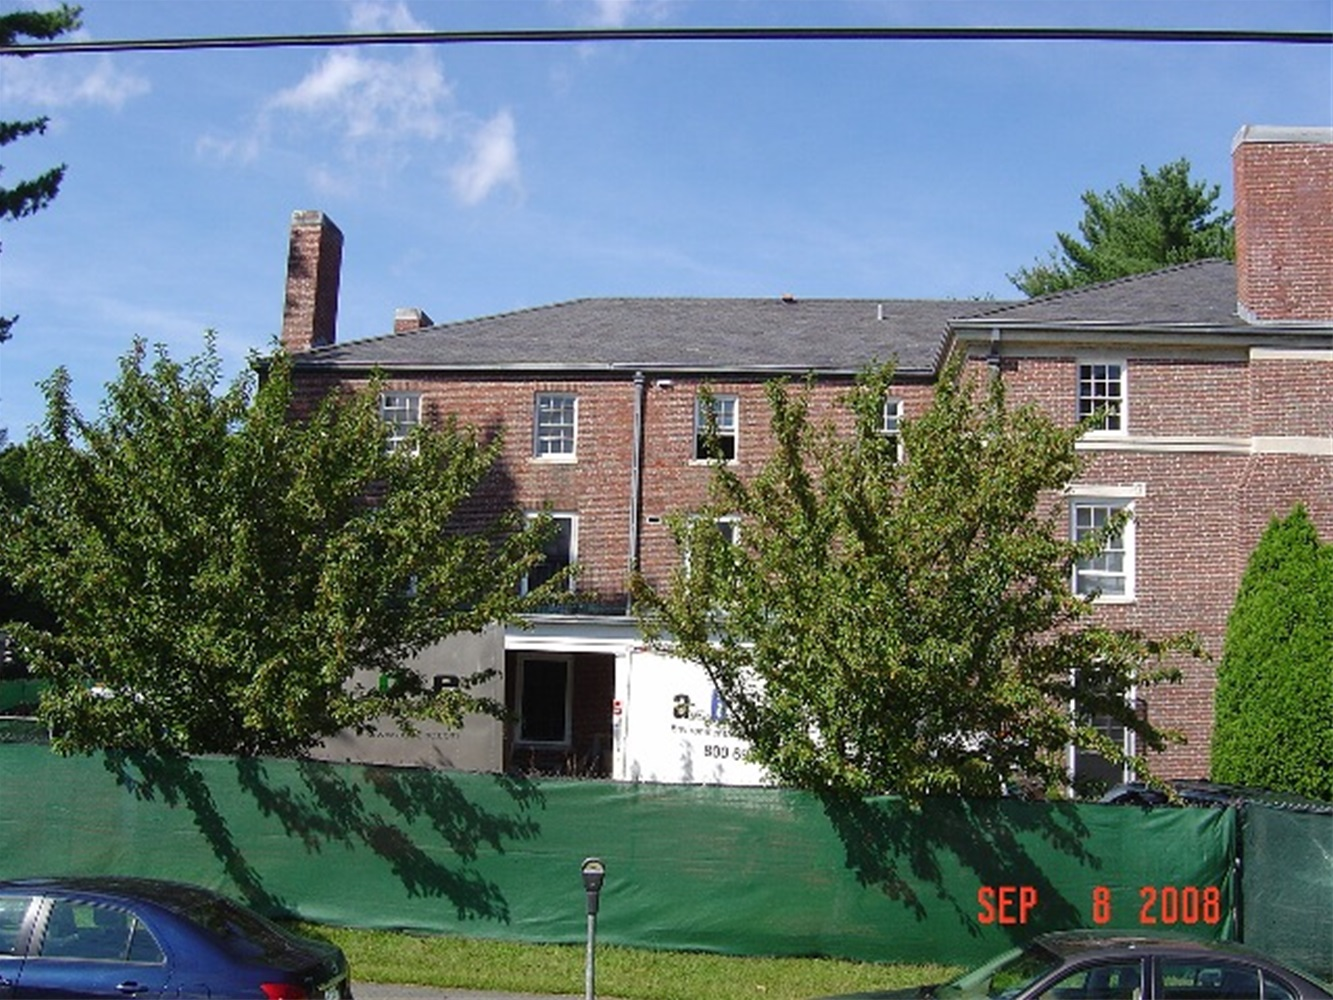 amherst college hitchcock building cornerstone architectural